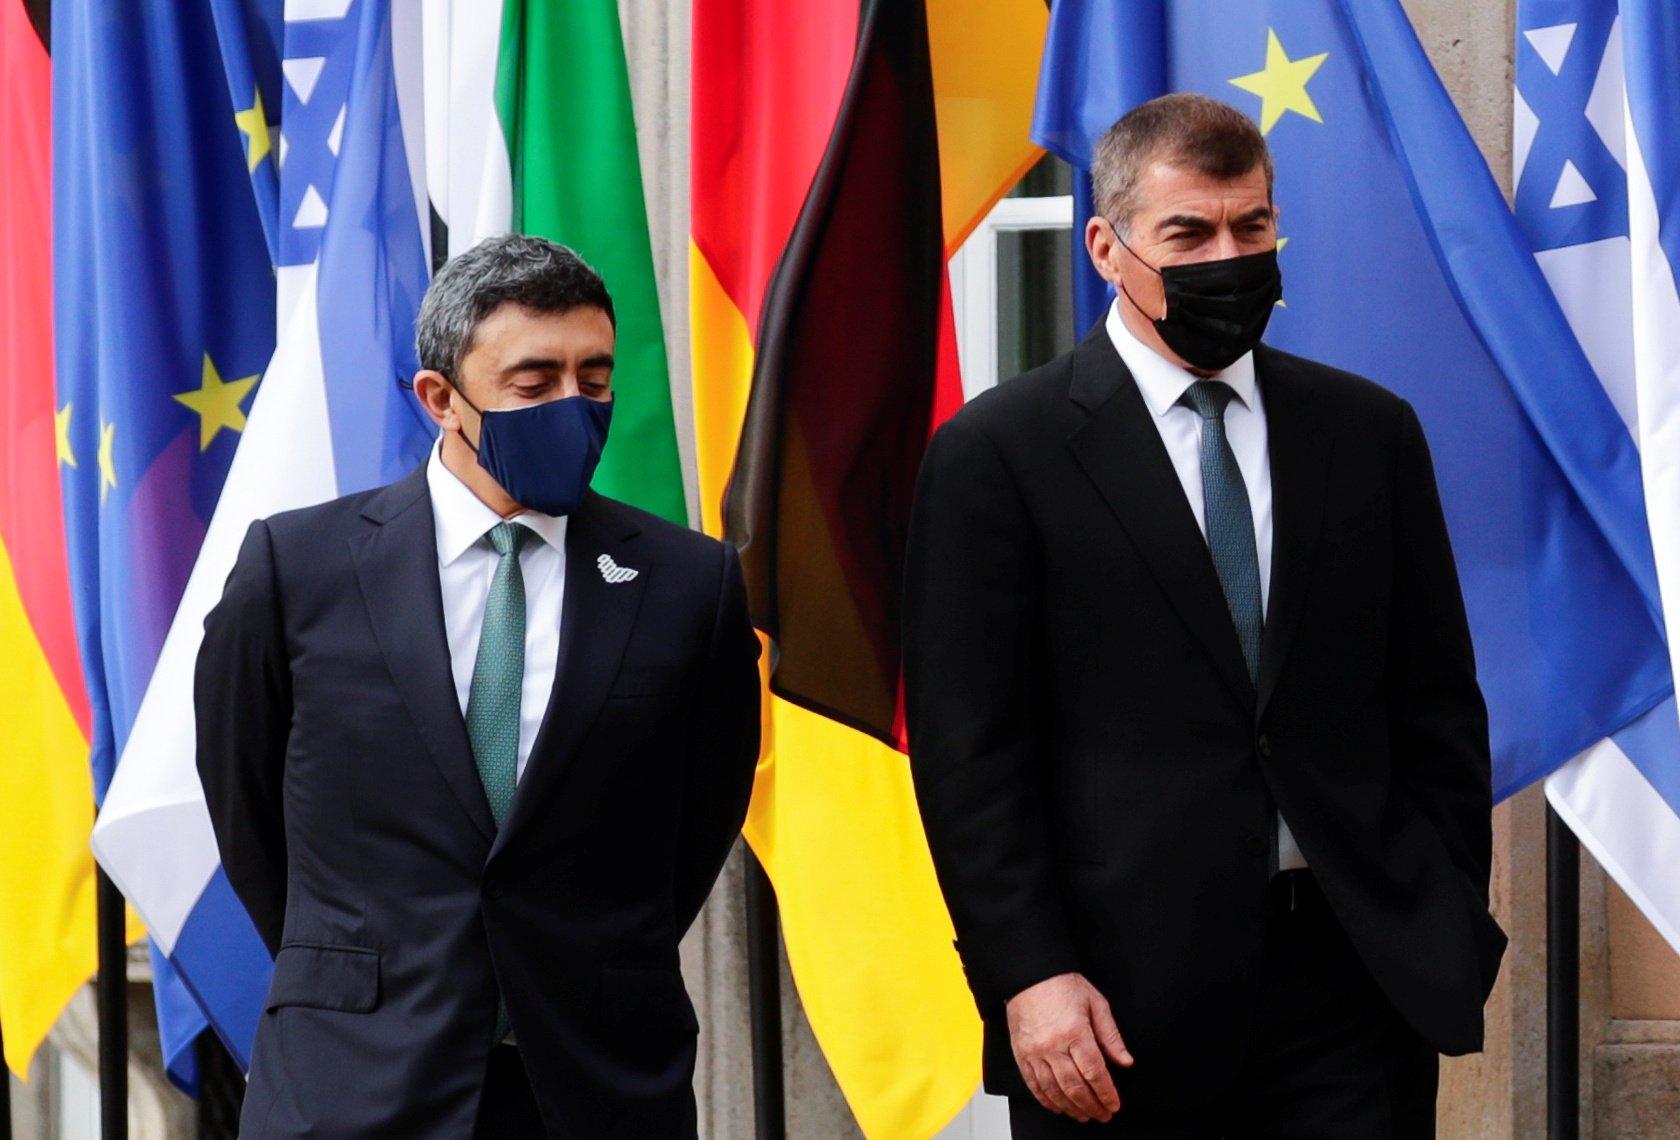 阿聯酋外長Sheikh Abdullah bin Zayed al-Nahyan(左)和以色列外長Gabi Ashkenazi會面資料照。(HANNIBAL HANSCHKE/POOL/AFP)